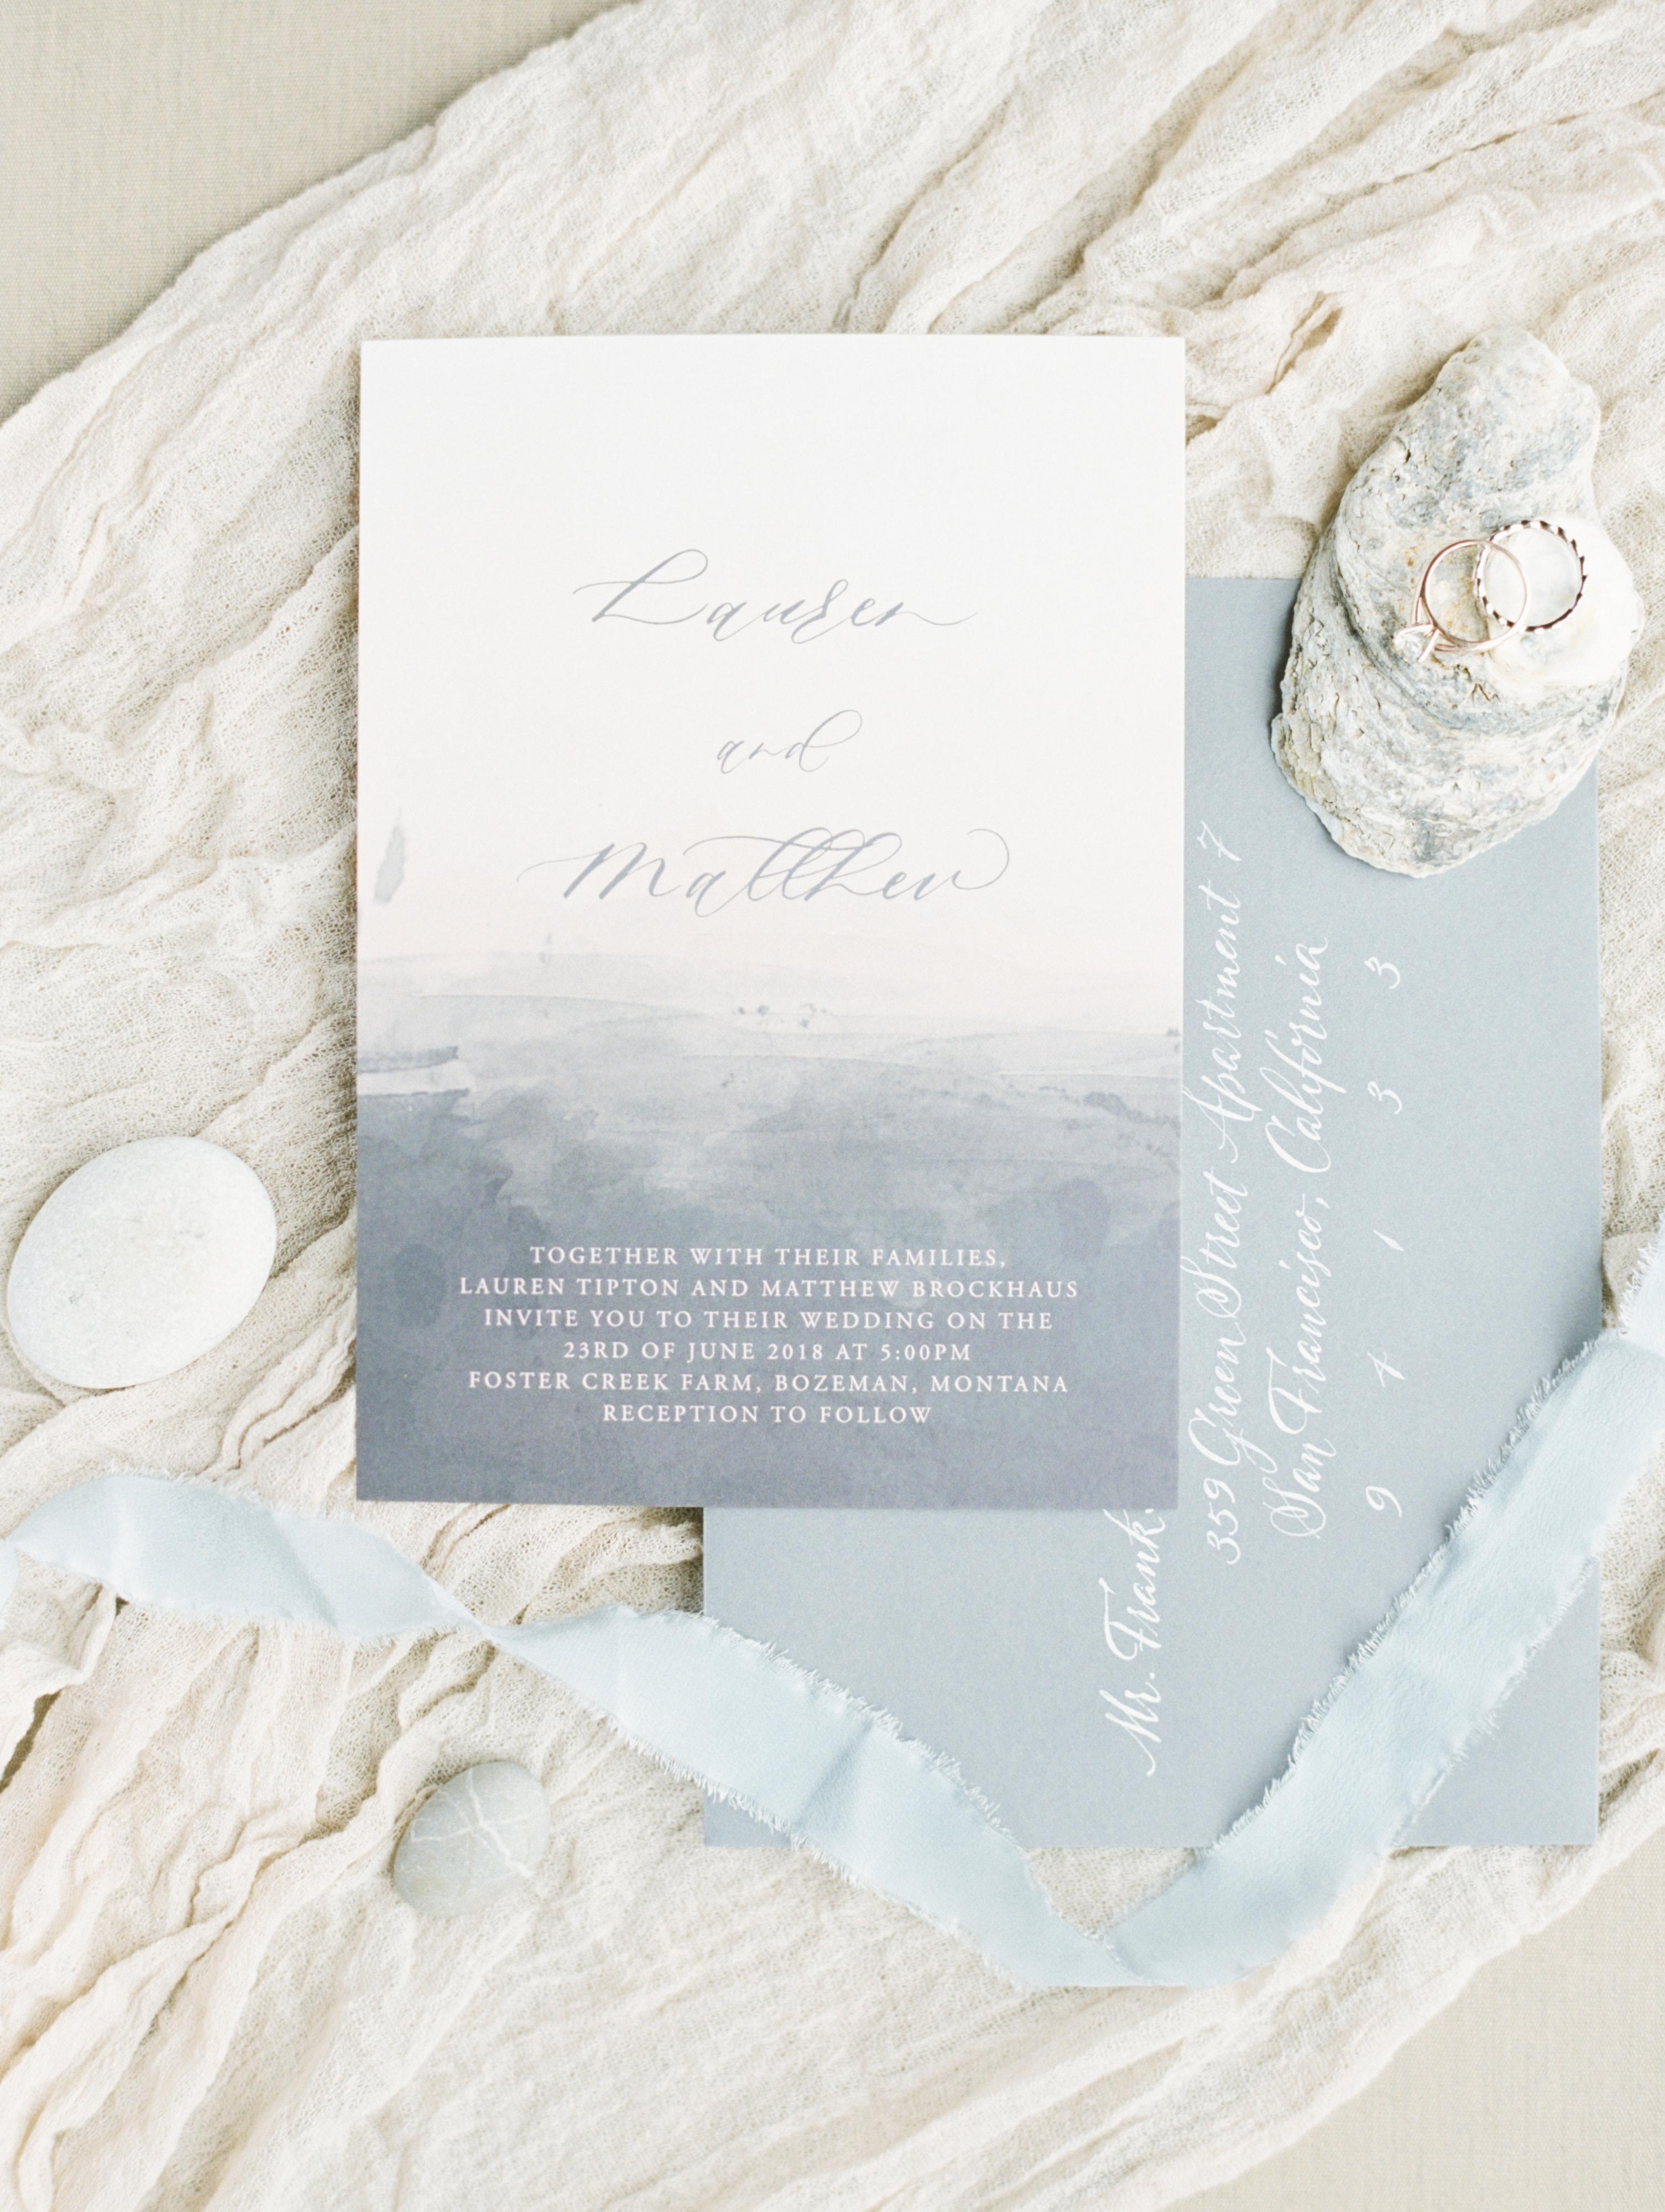 wedding invitation negative space ocean inspired